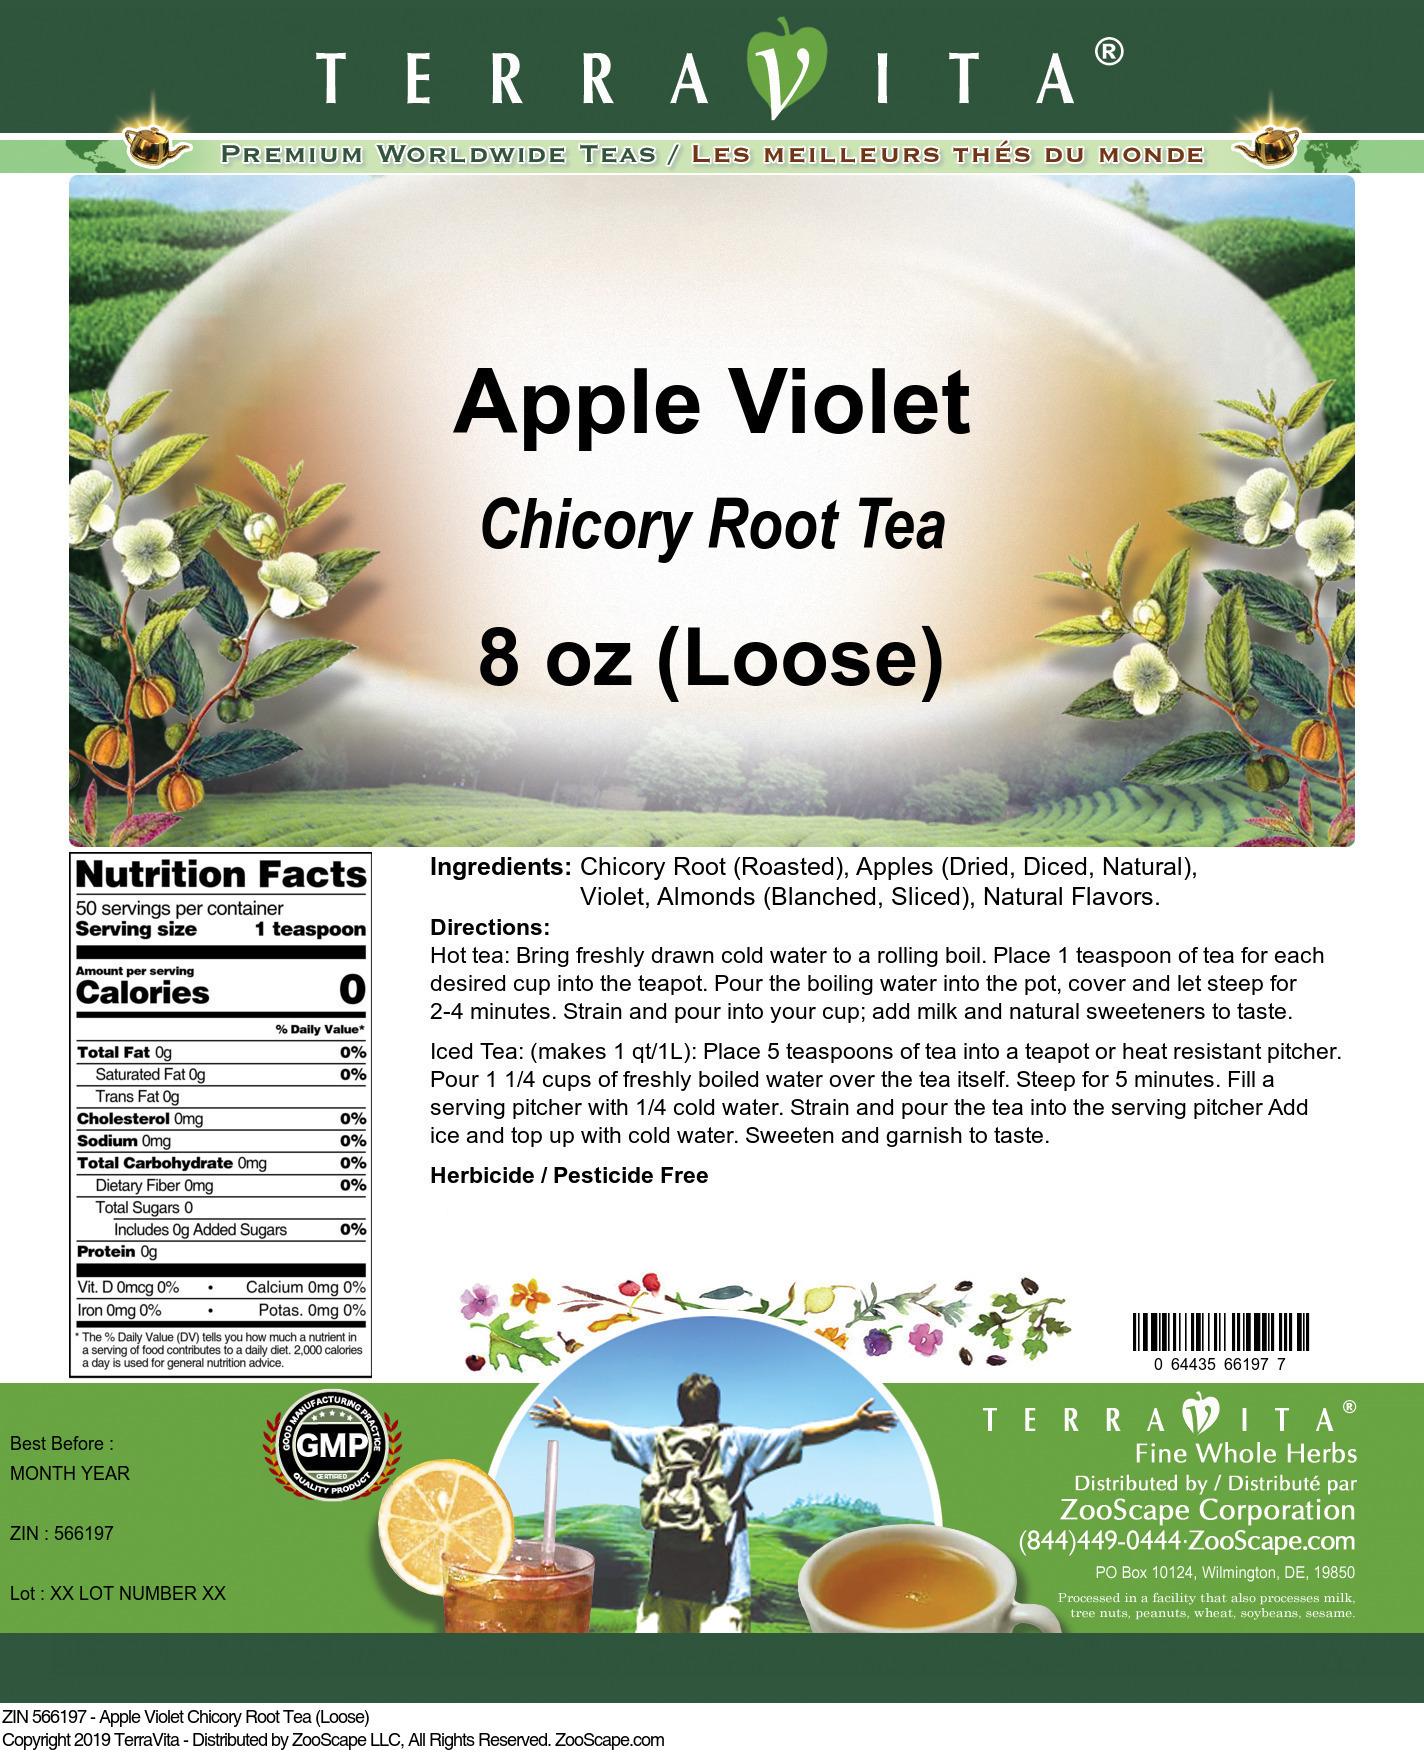 Apple Violet Chicory Root Tea (Loose)